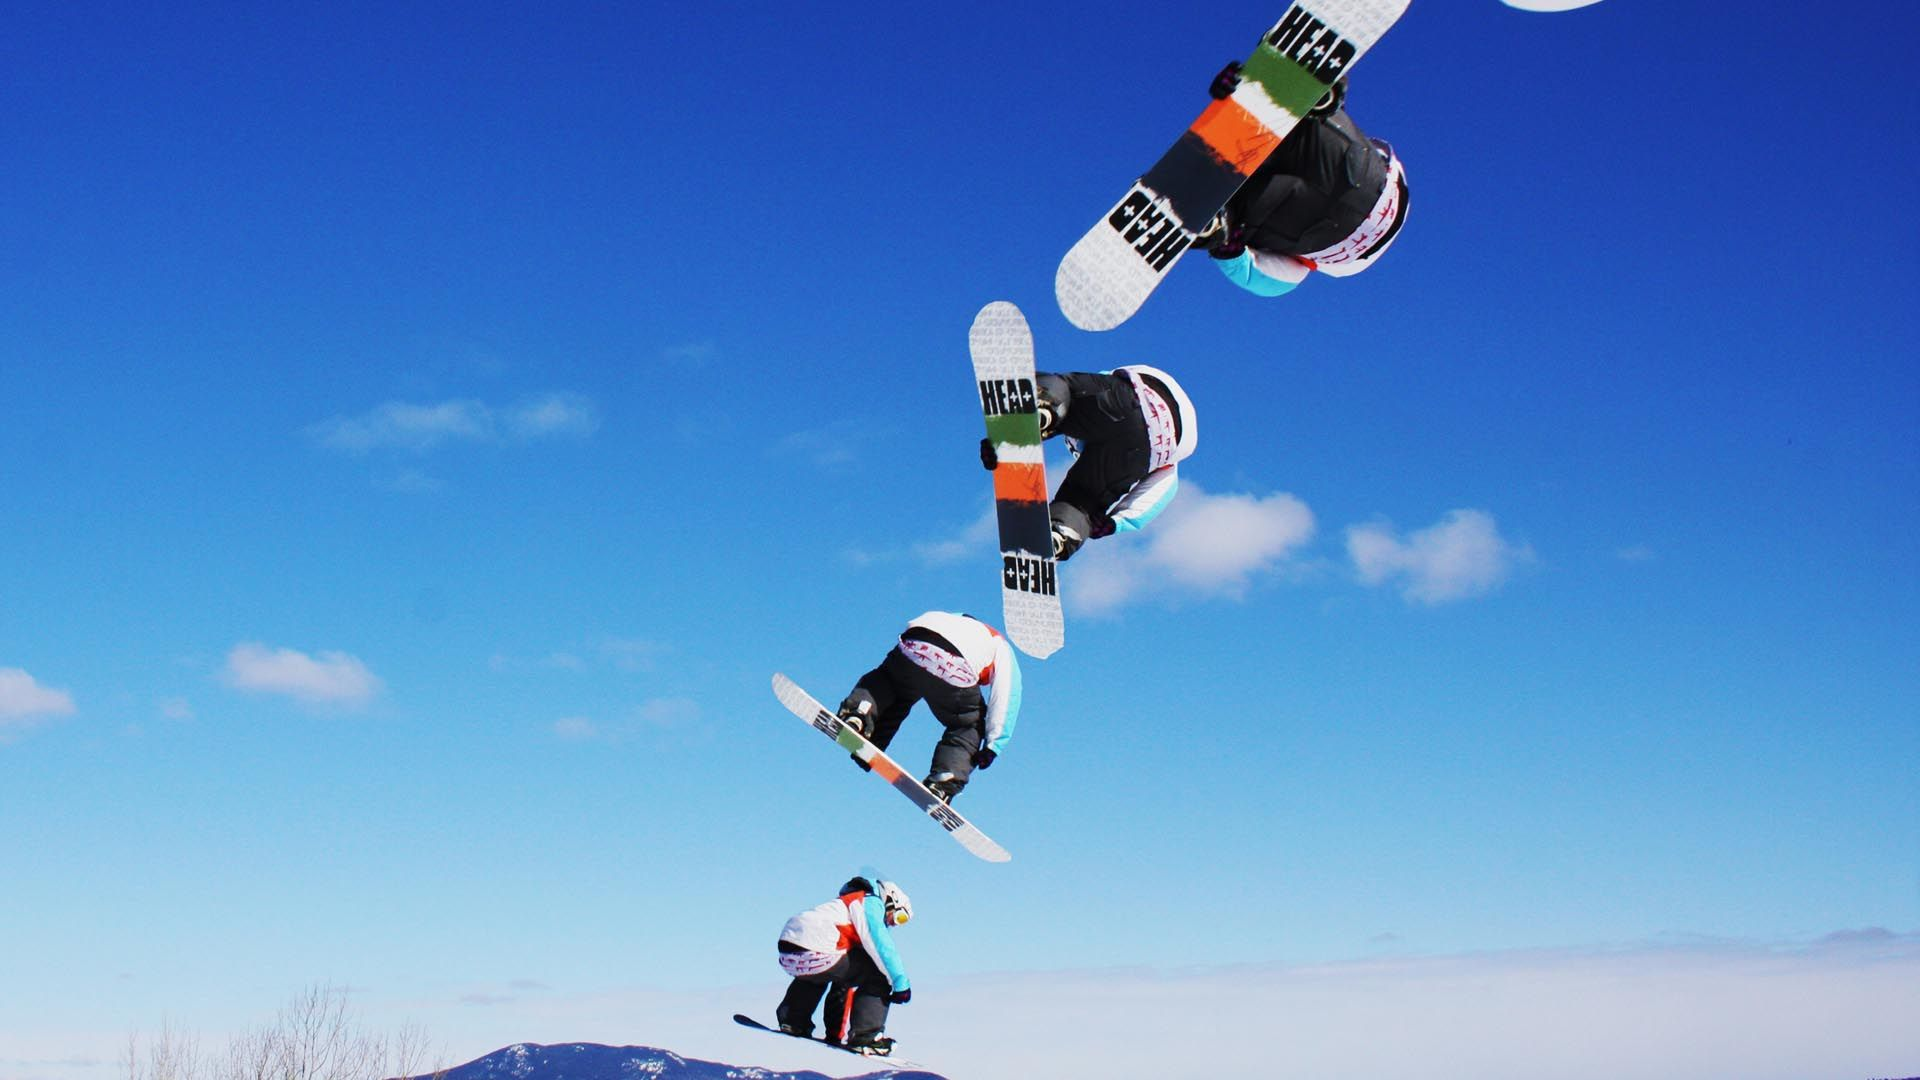 Wintersports Snowboarding Grab Hd Wallpaper Fullhdwpp Full Hd Wallpapers 1920x1080 Snowboarding Sports Wallpapers Snowboard